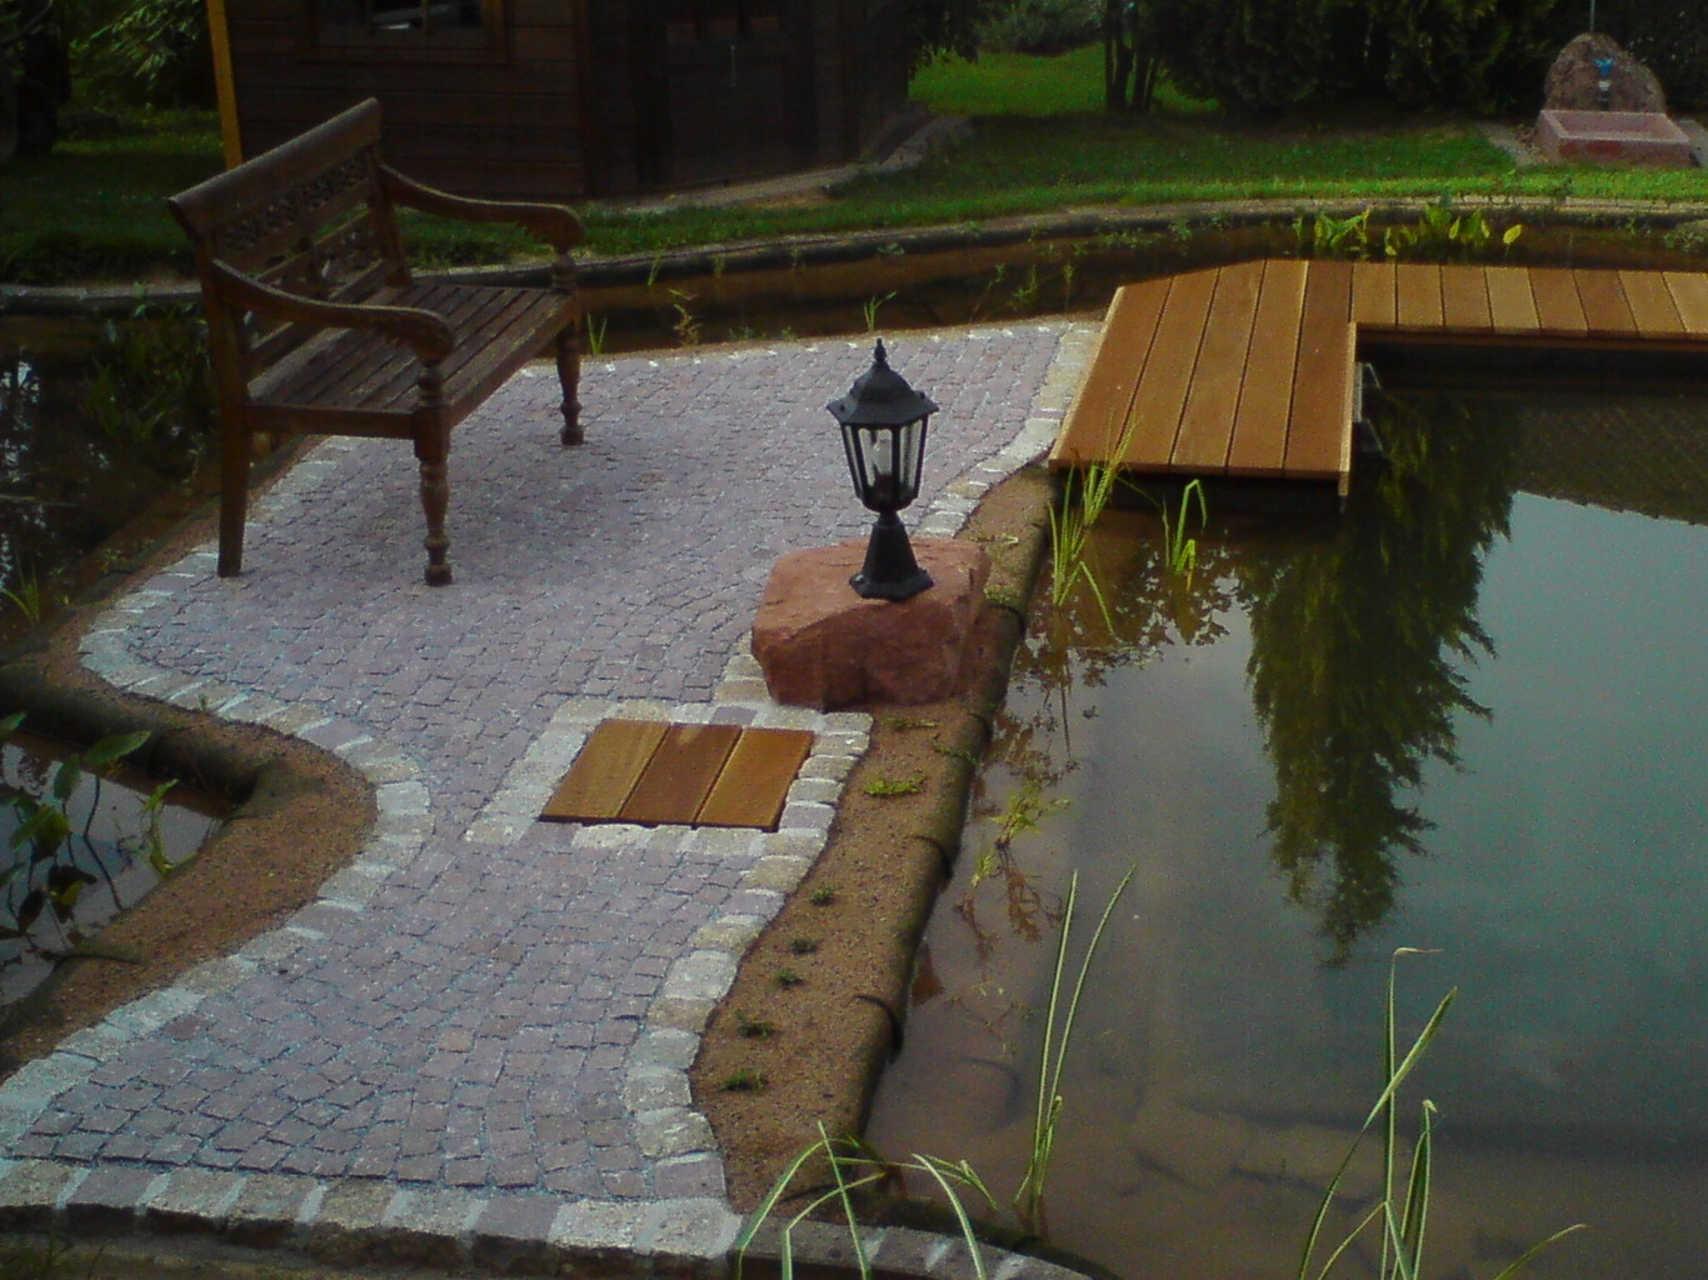 Sitzplatz aus Granitpflaster